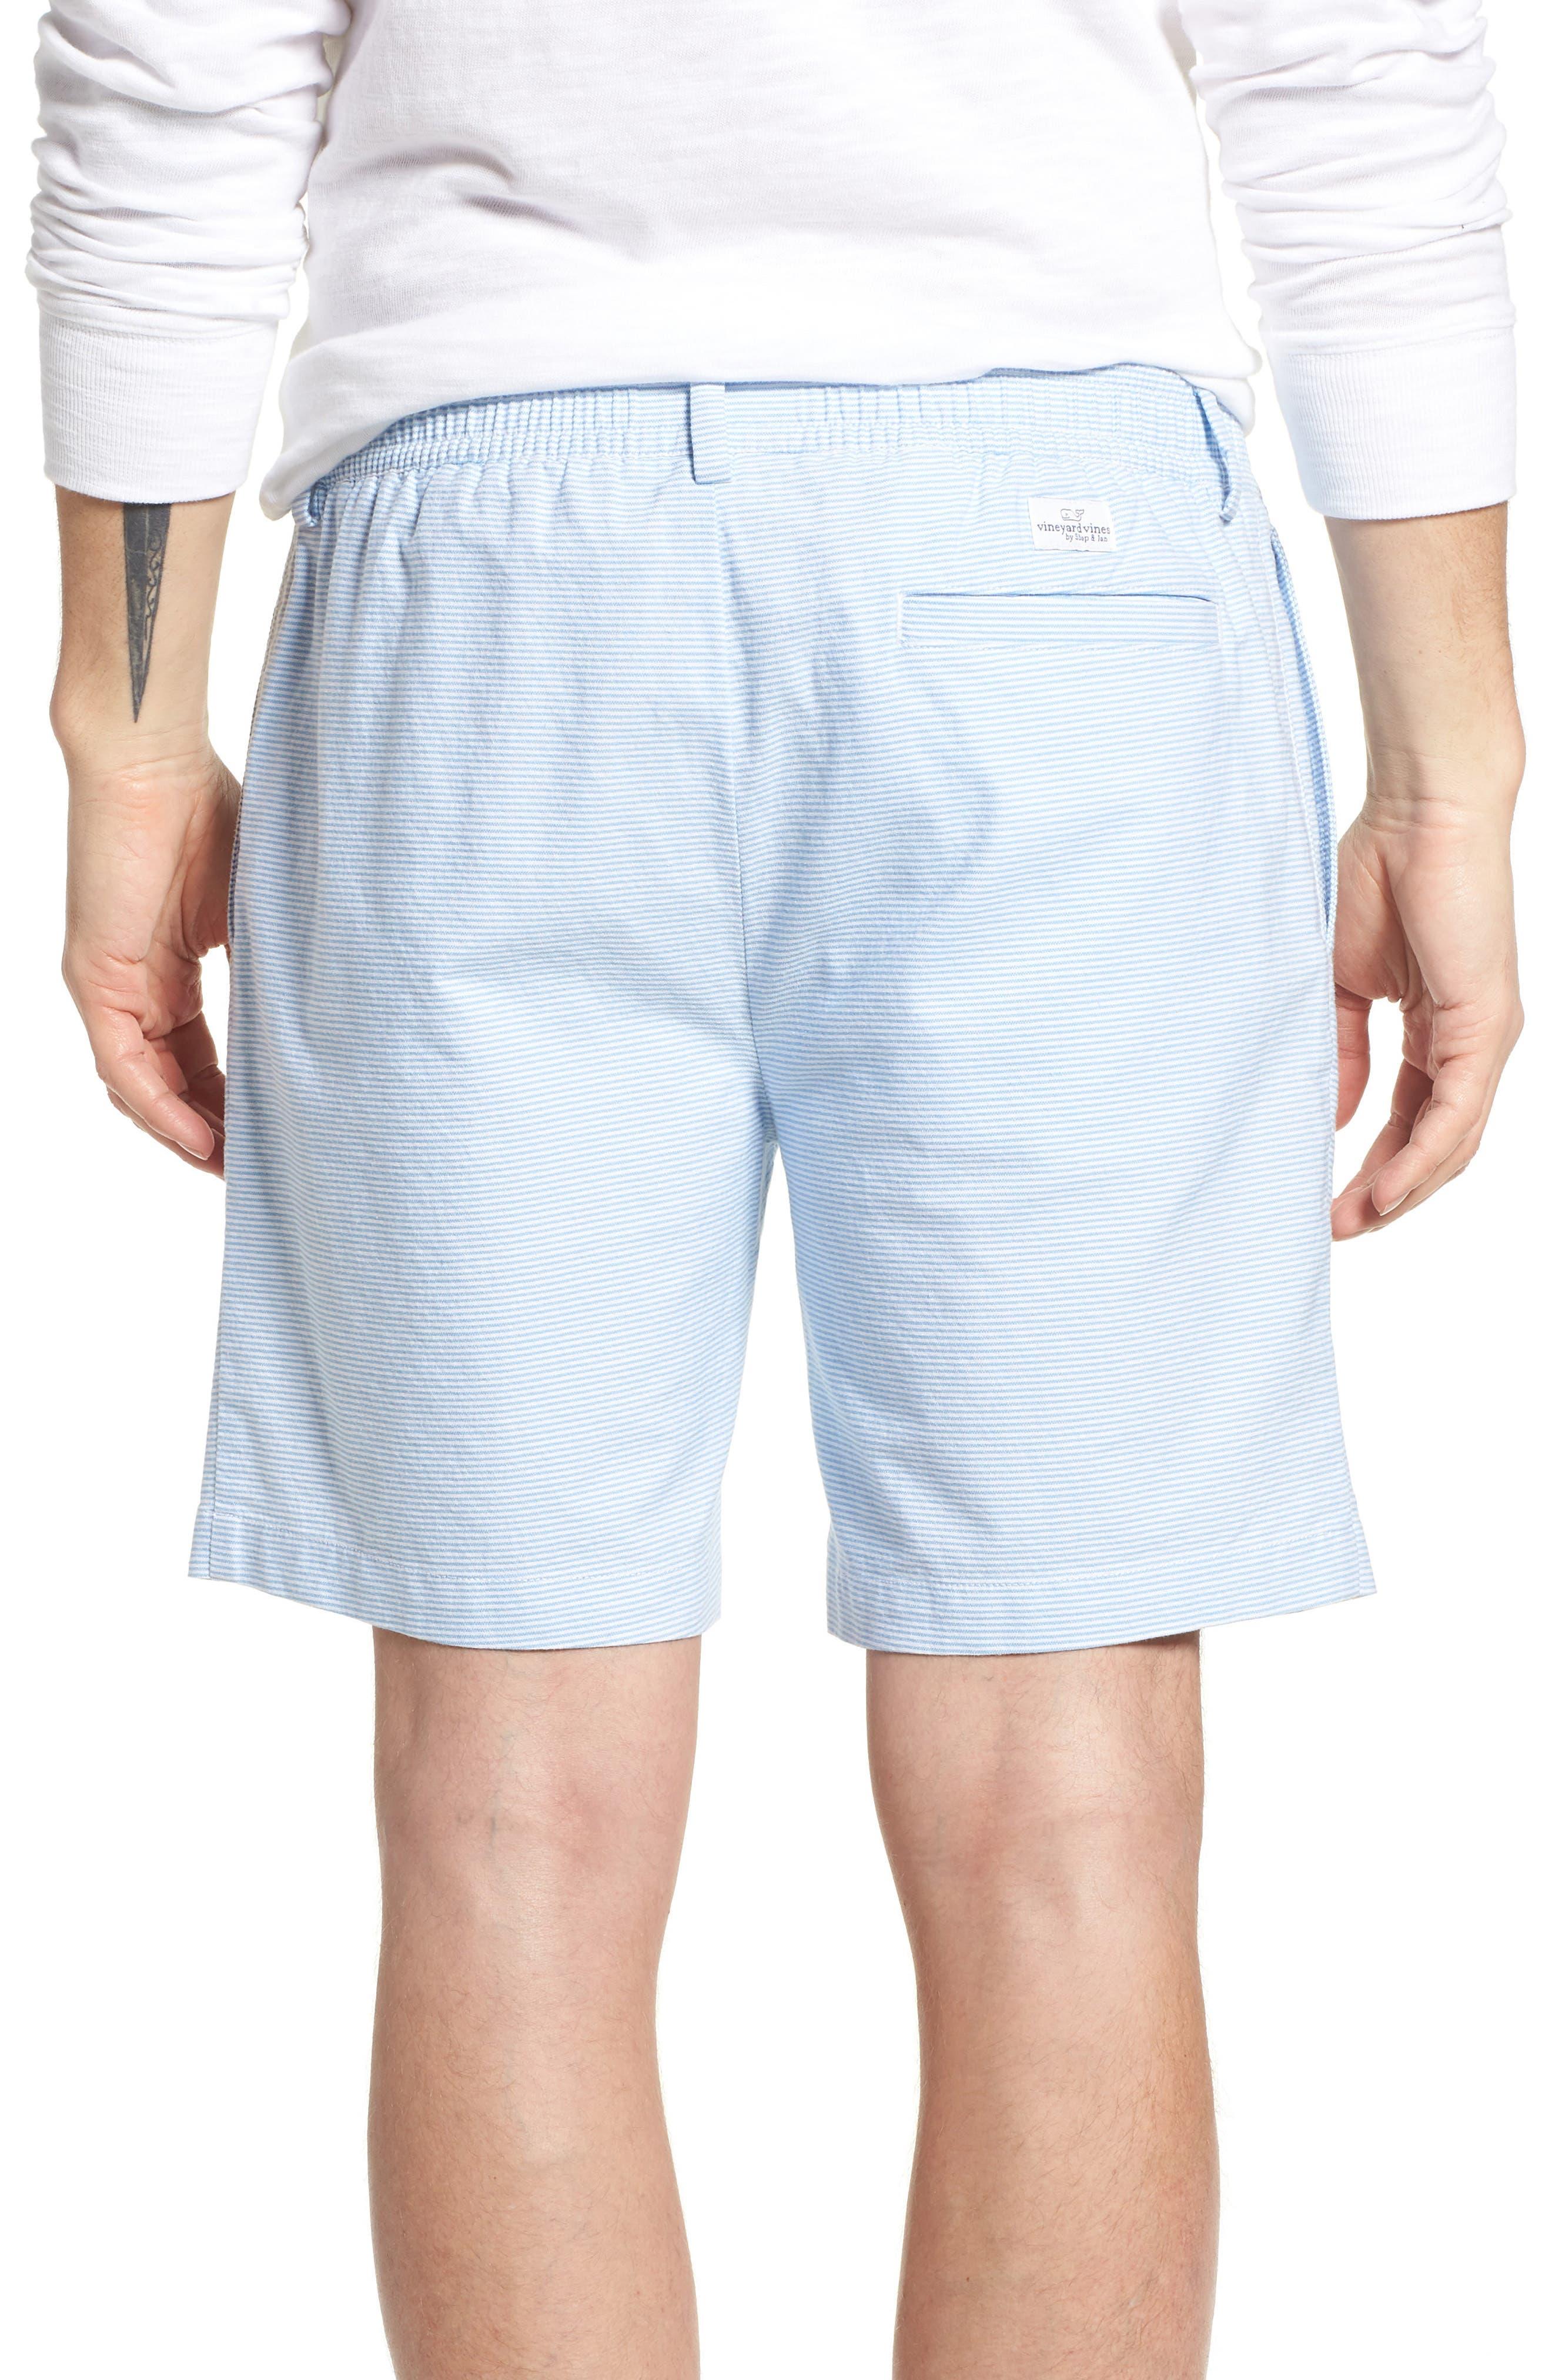 Jetty Stripe Stretch Cotton Shorts,                             Alternate thumbnail 2, color,                             Ocean Breeze